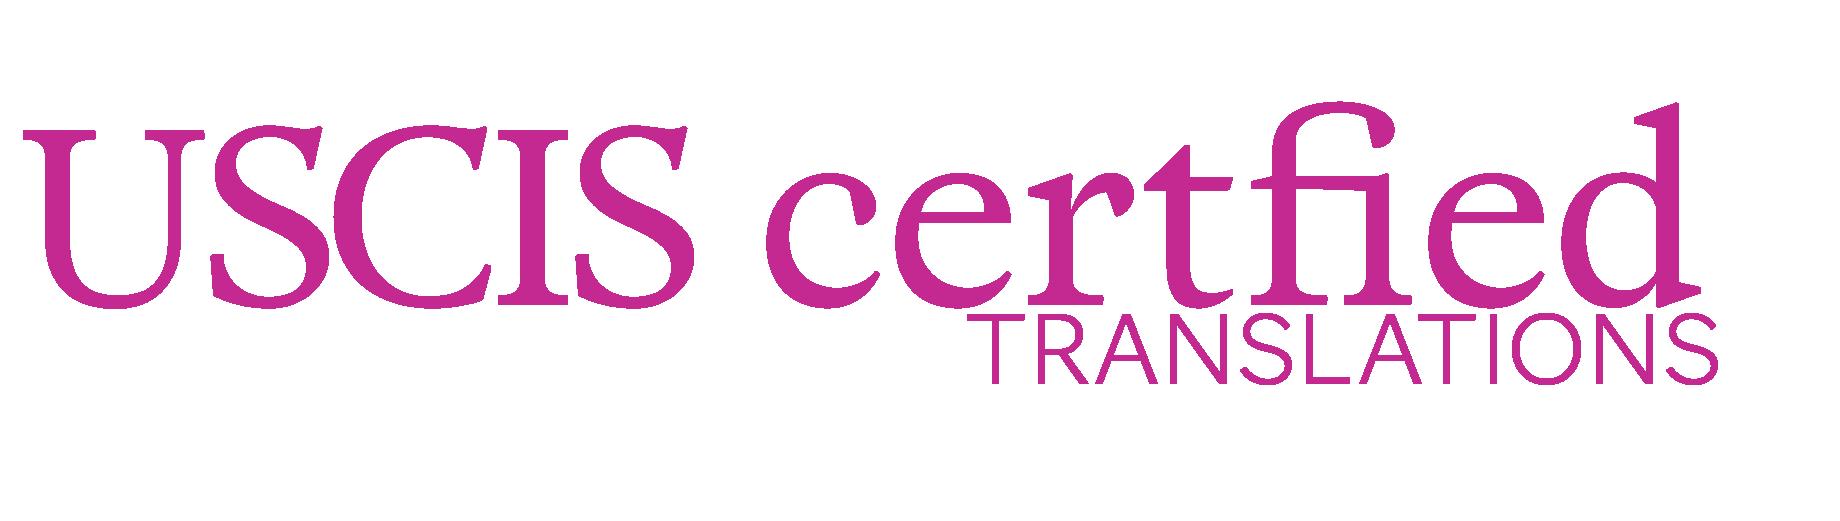 USCIS Certified Translations